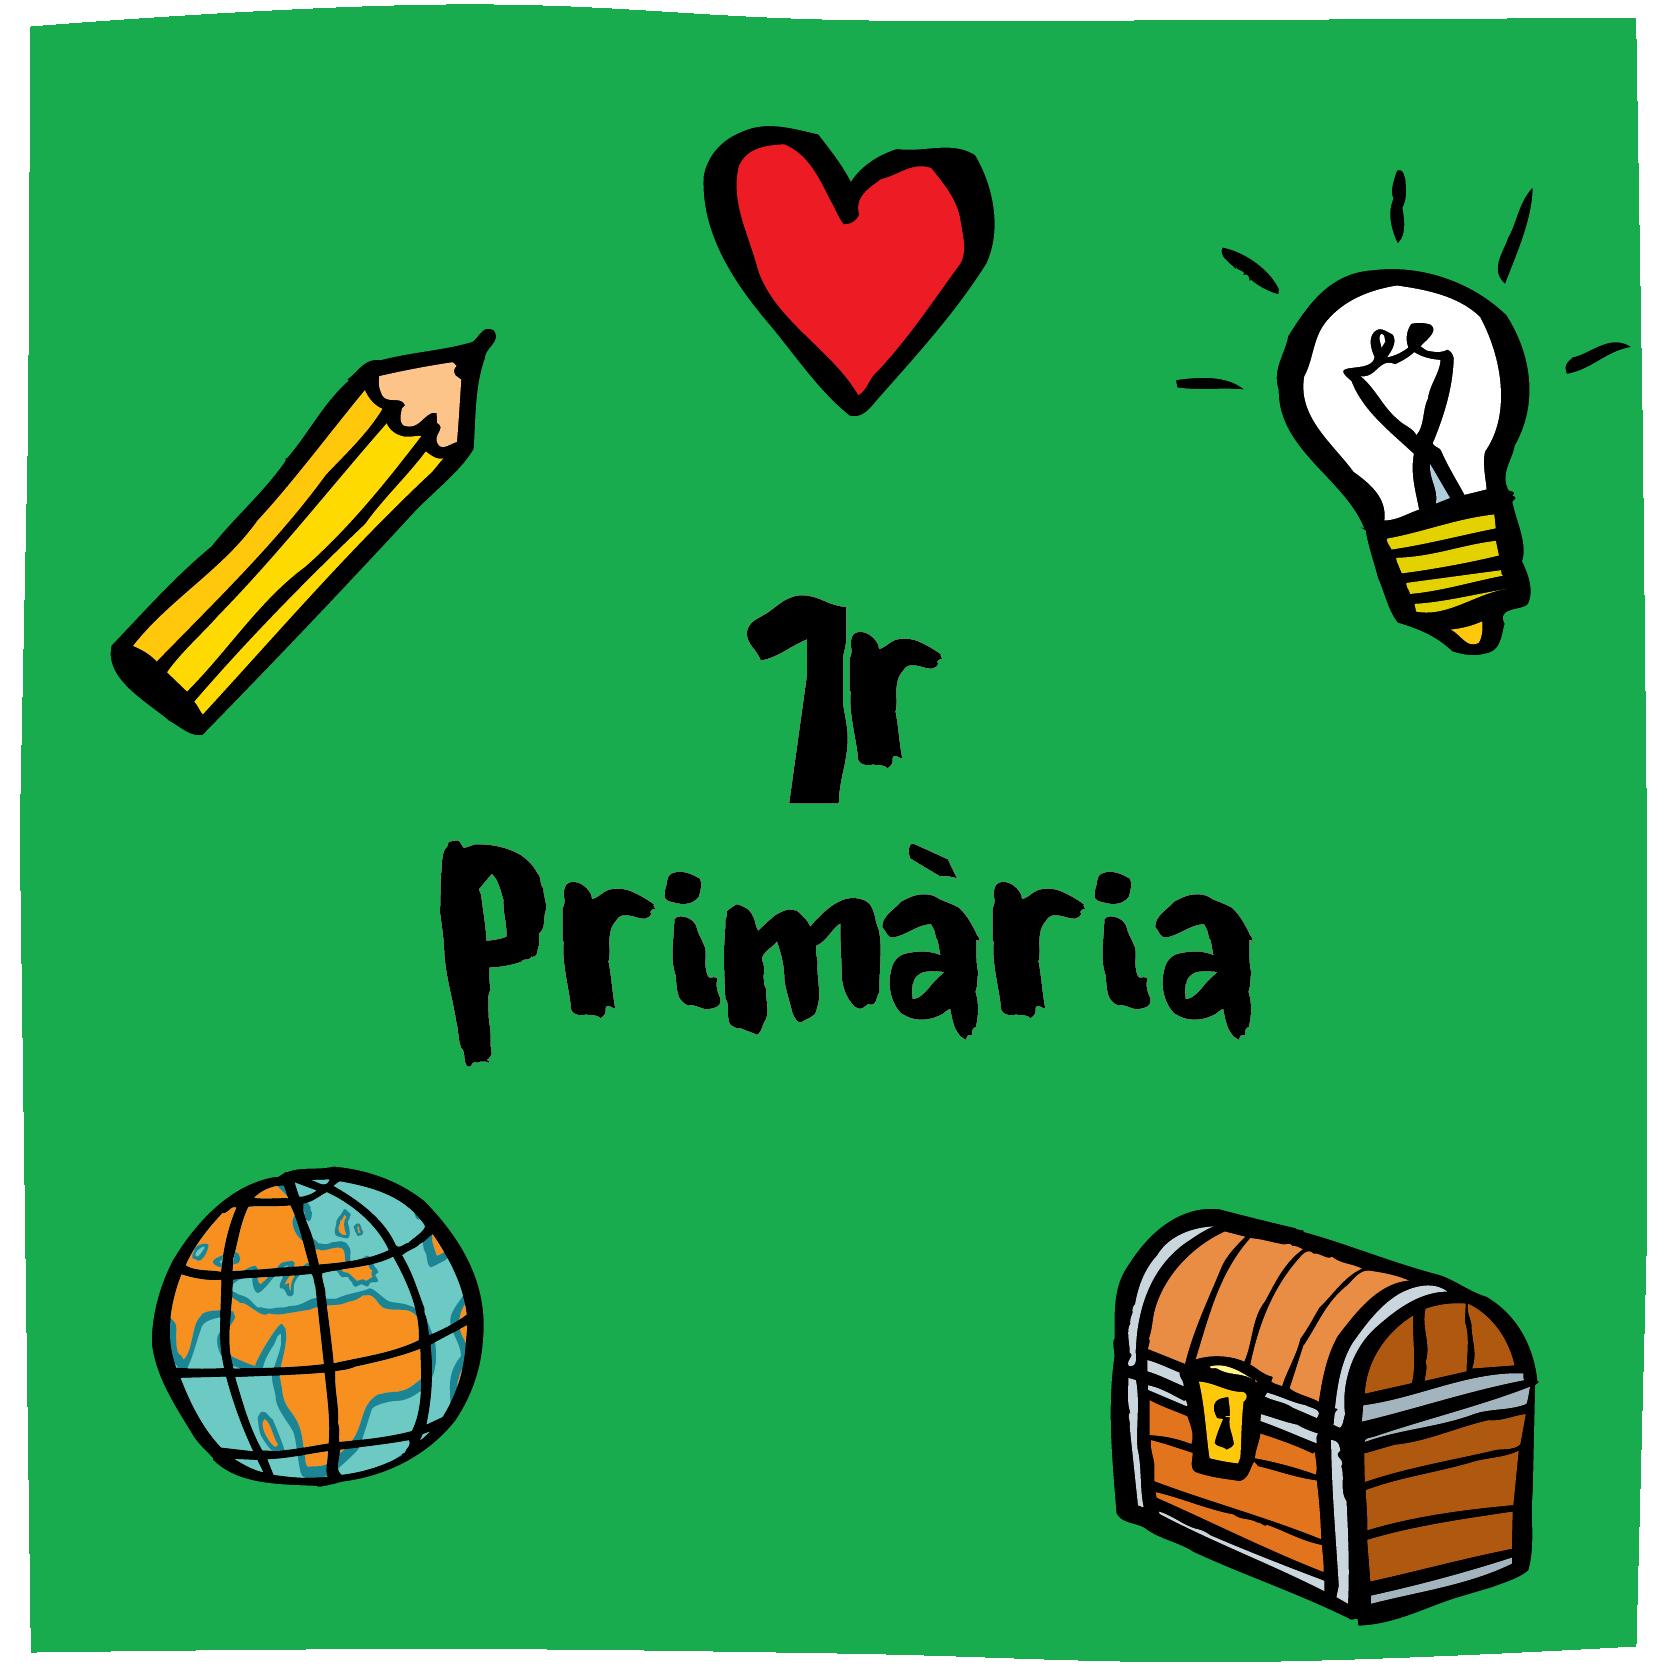 Primer primaria (Prova)